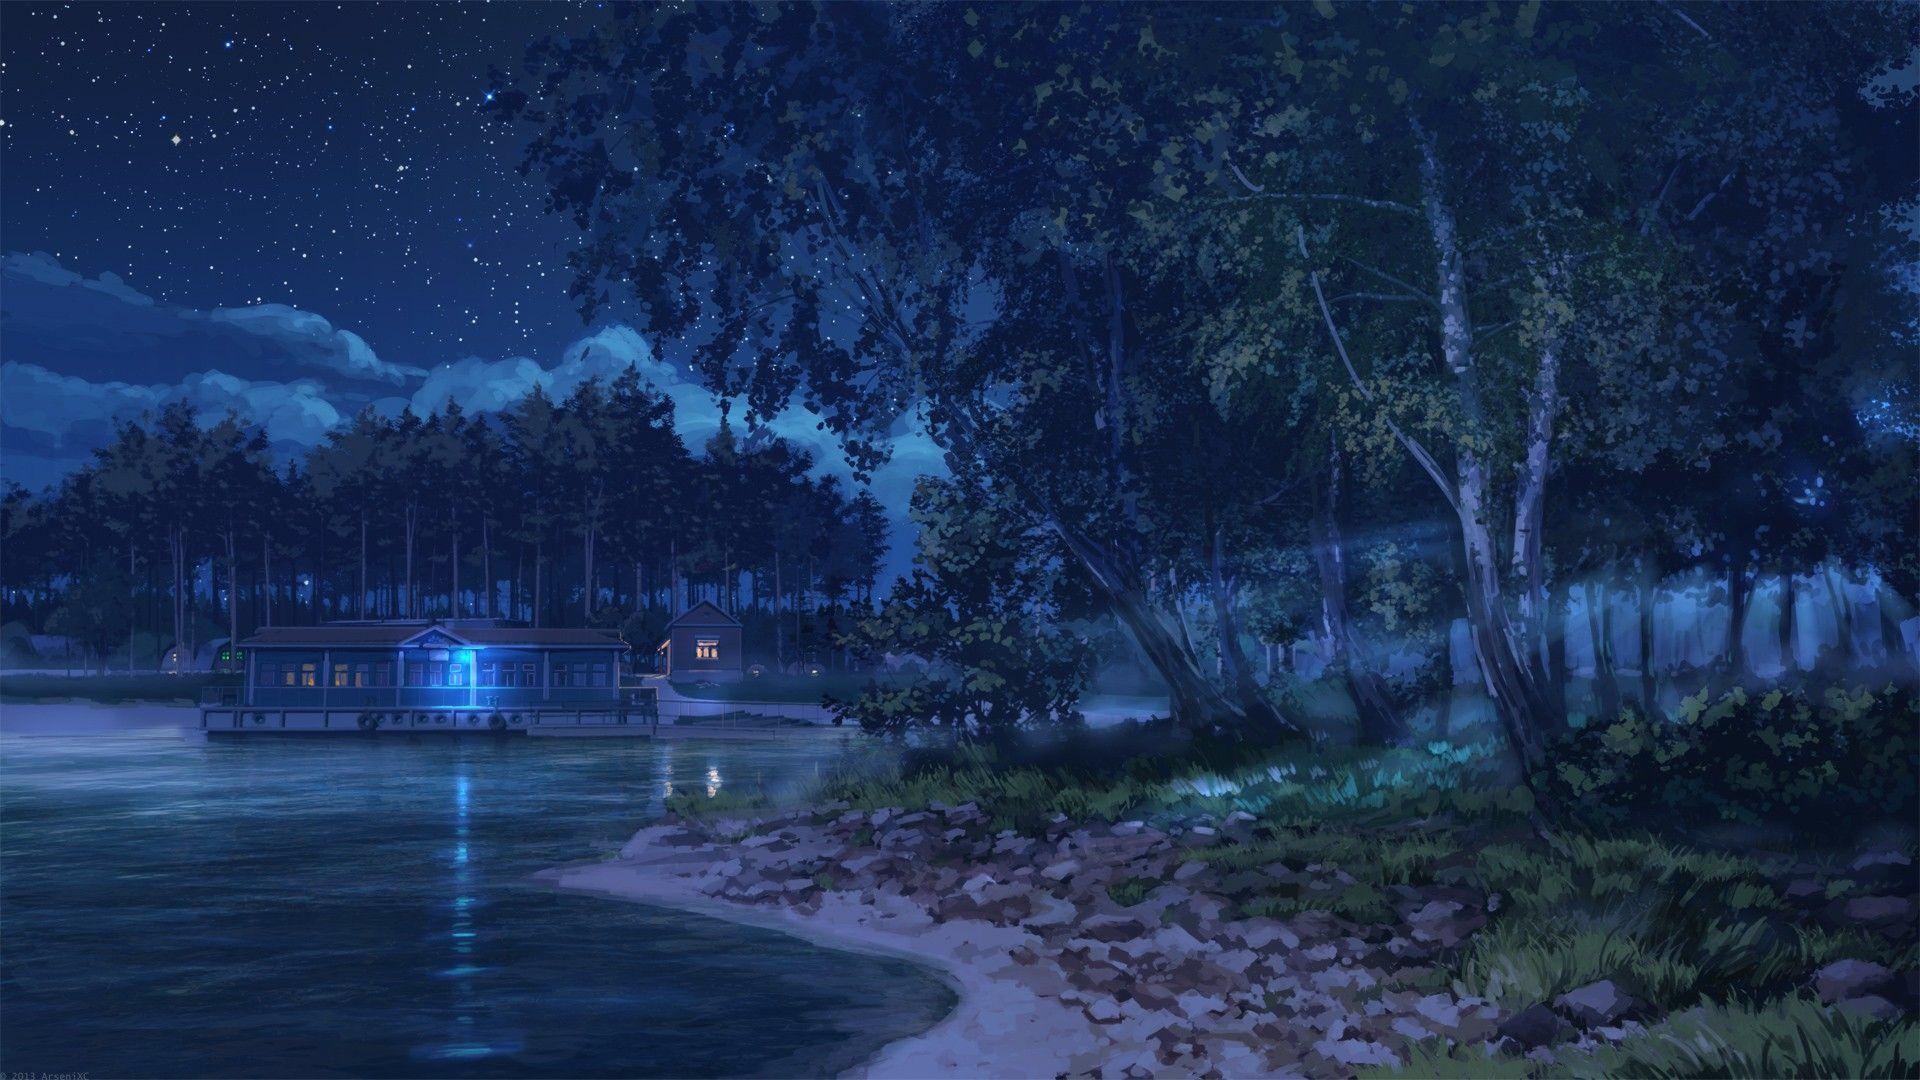 Anime Scenery Dark Landscape Scenery Wallpaper Anime Scenery